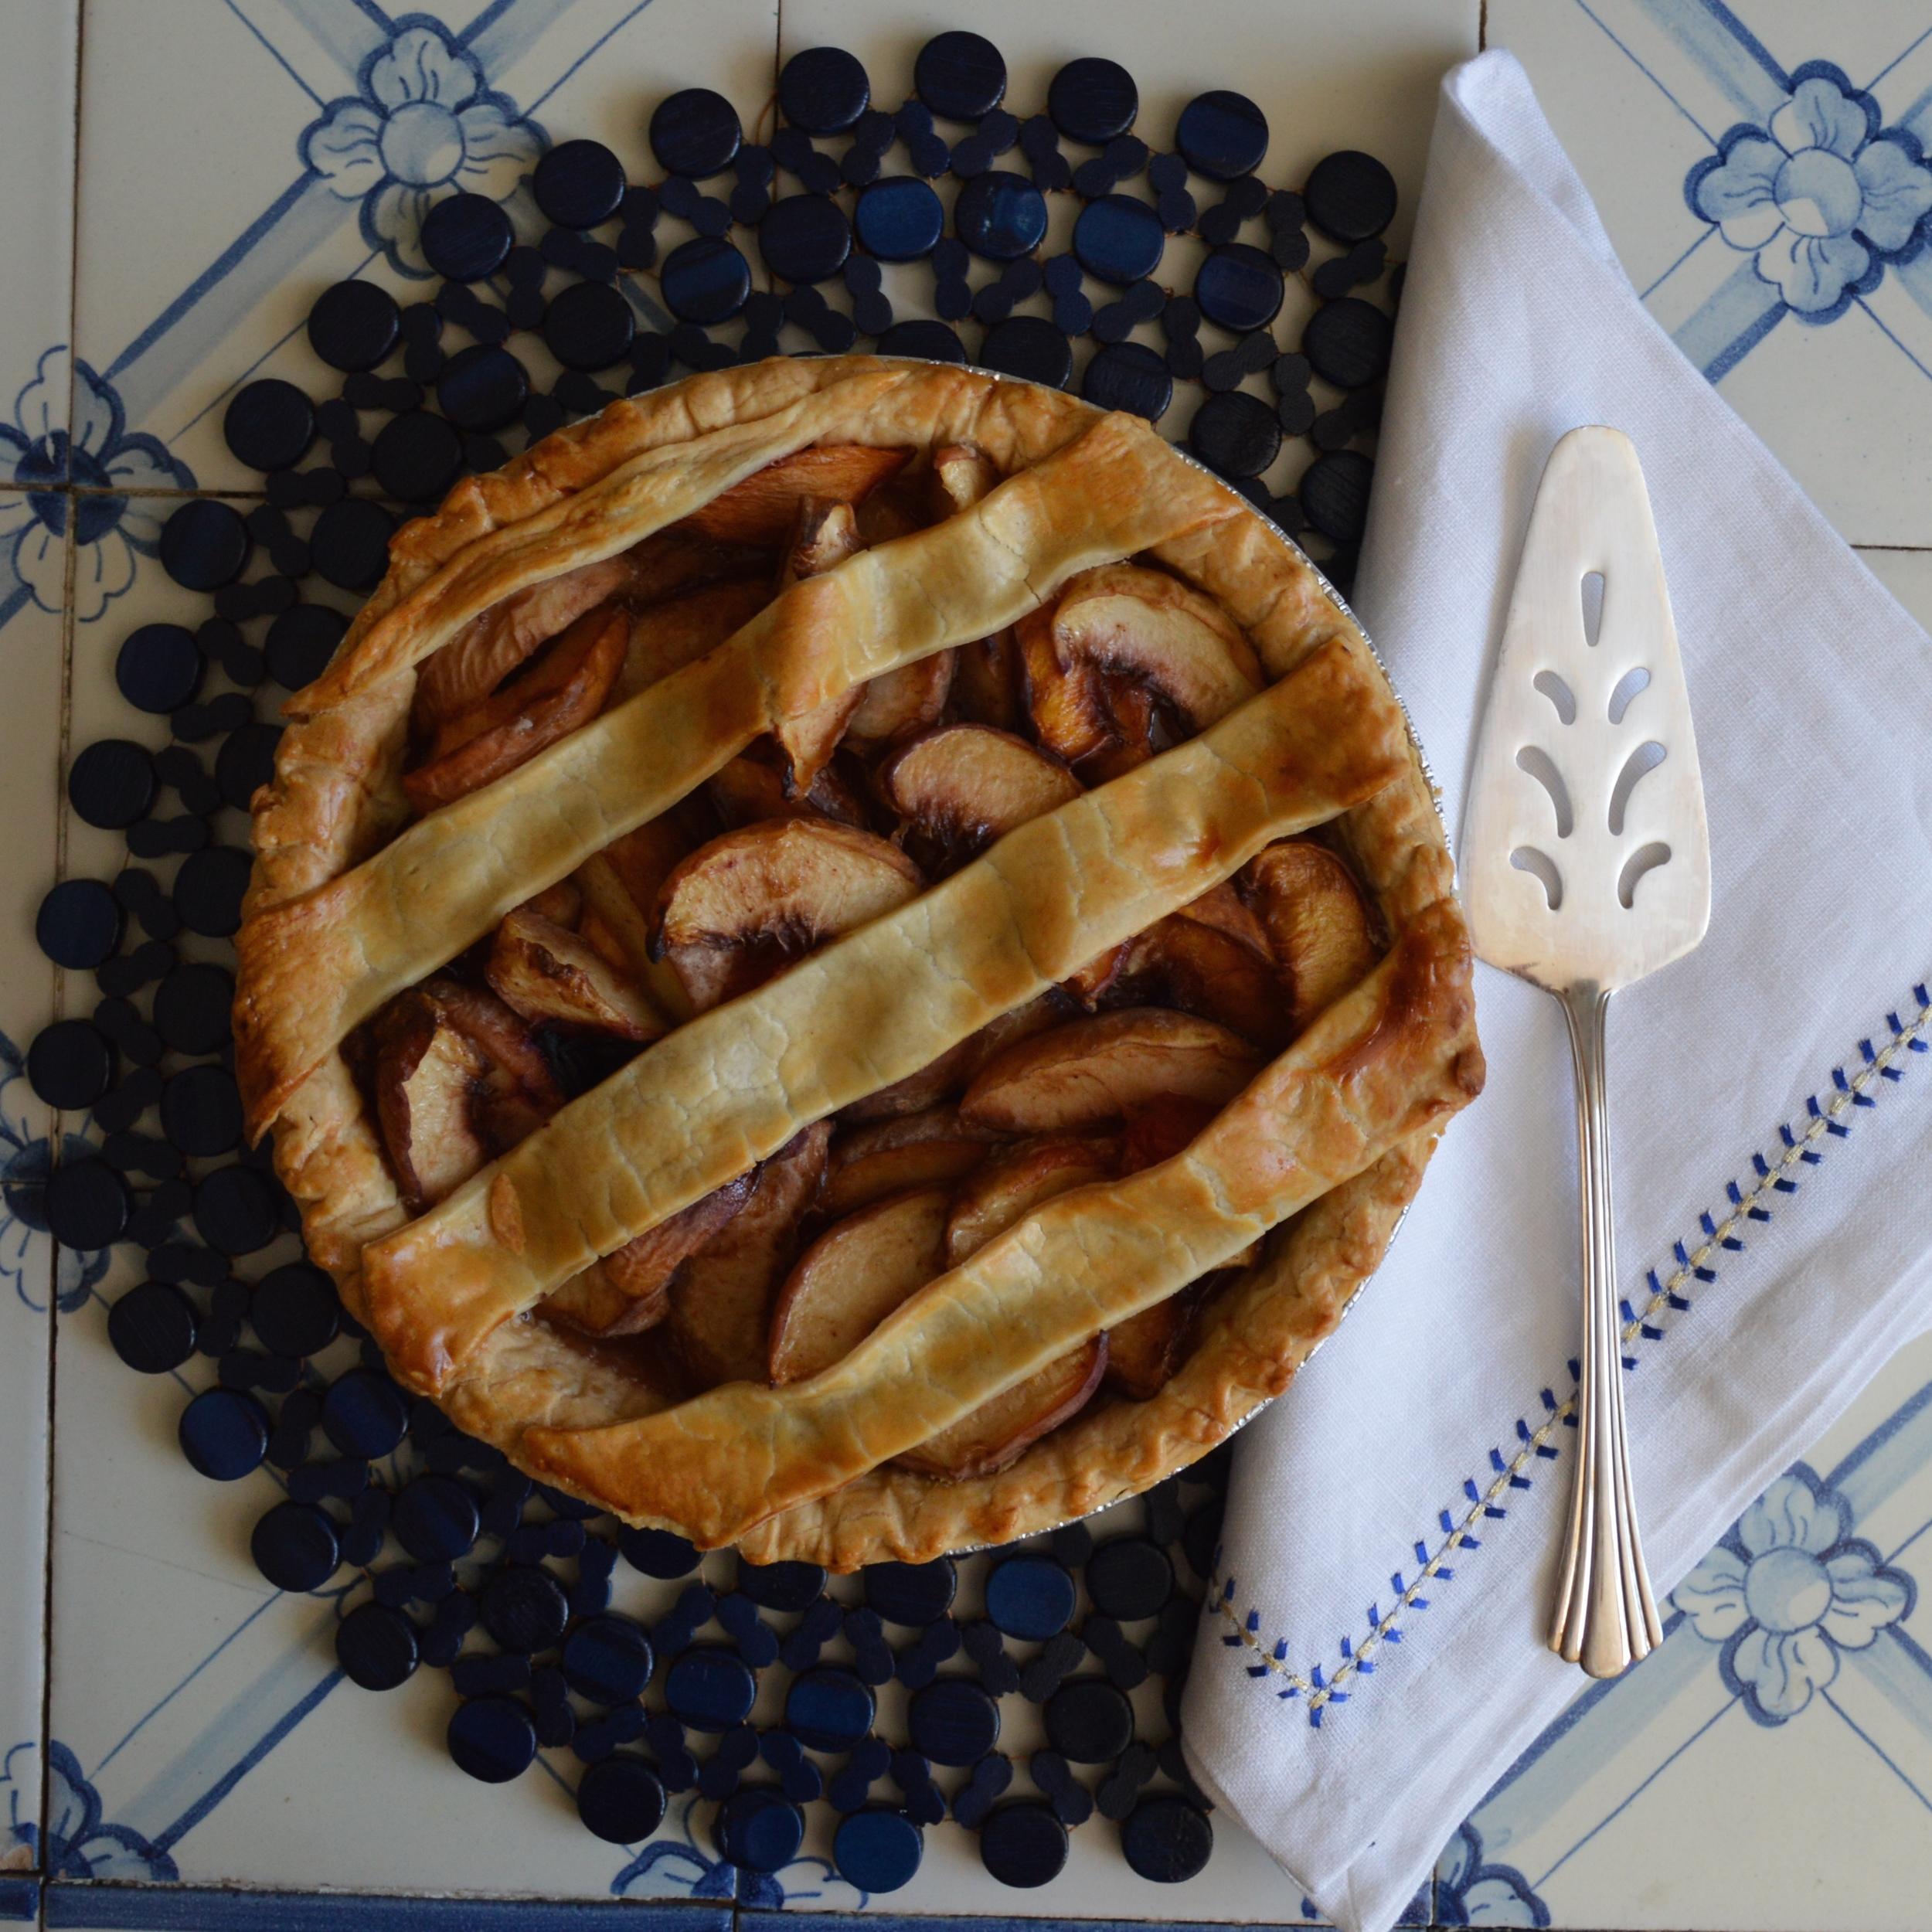 Dessert: Stone Fruit Pie with a loom crust